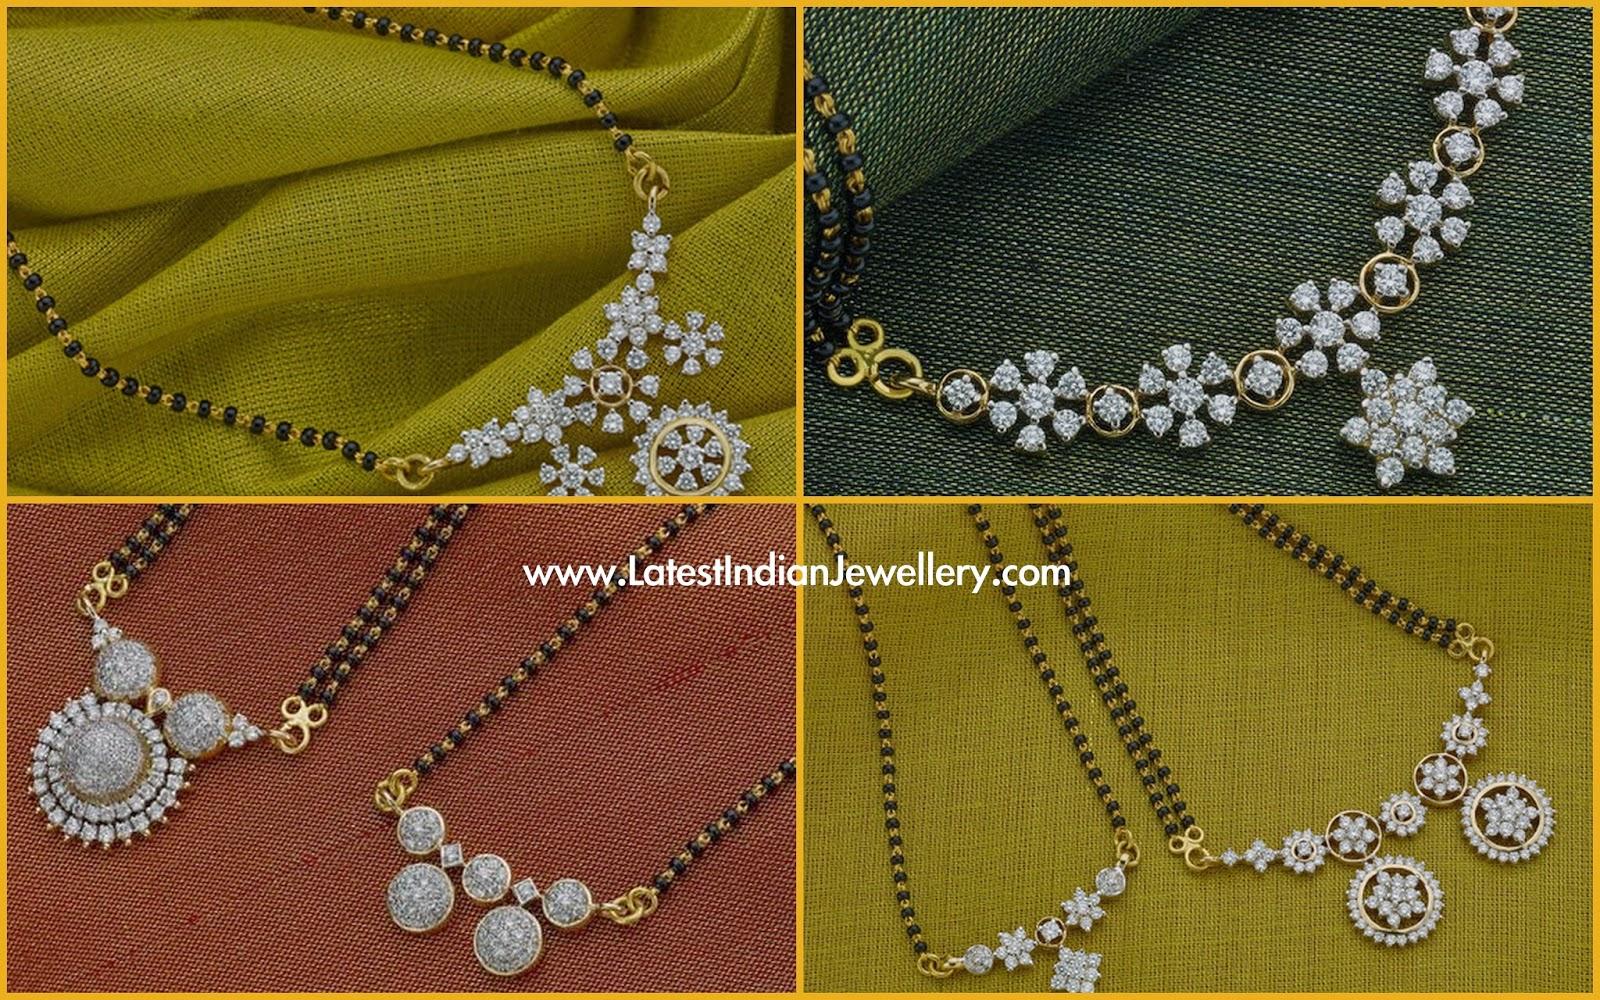 Diamond Pendant Black Beads Mangalsutra Designs Latest